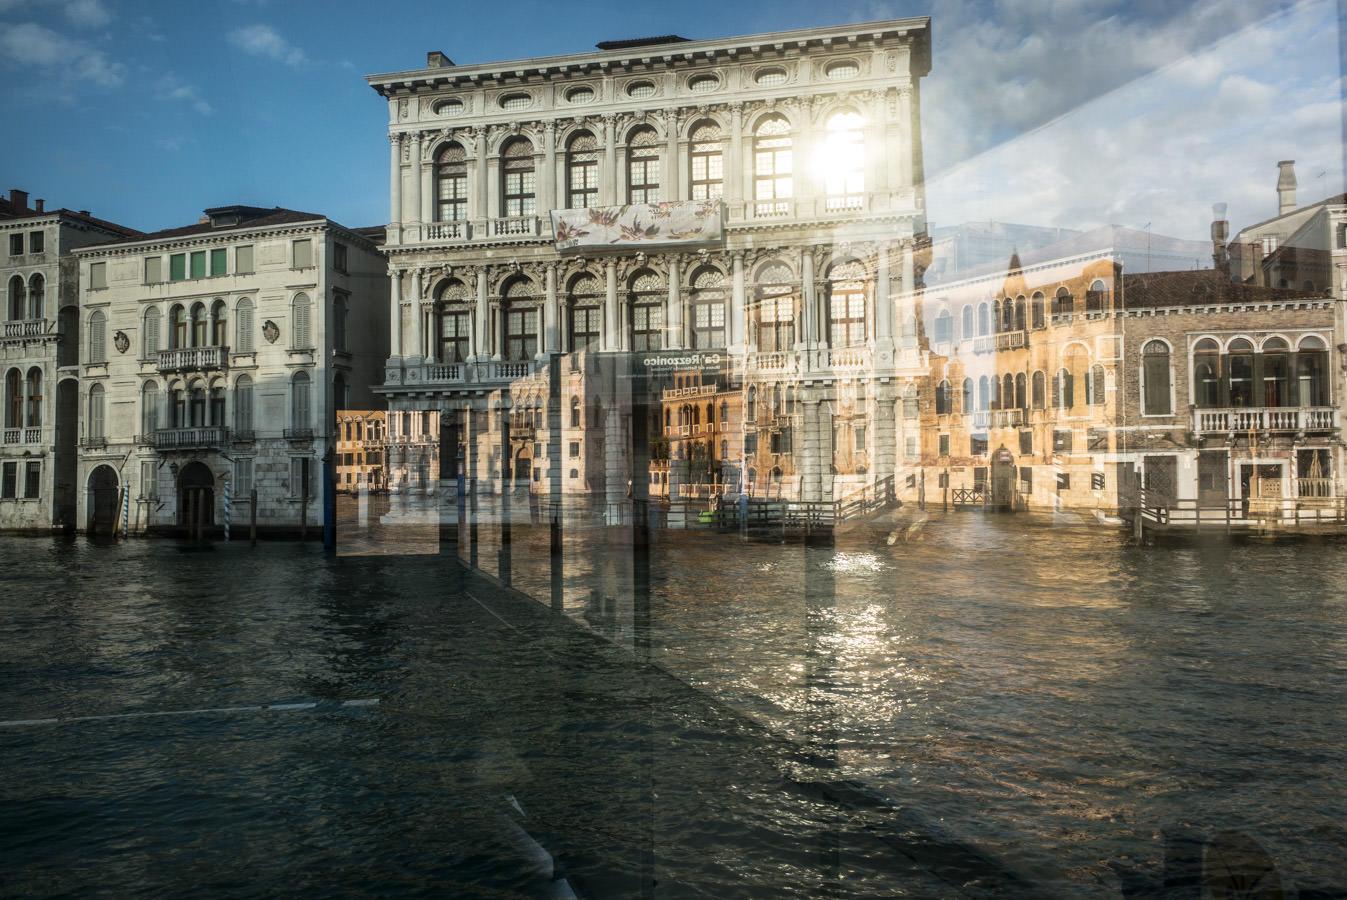 La façade du Palazzo Rezzonico sur le Grand Canal